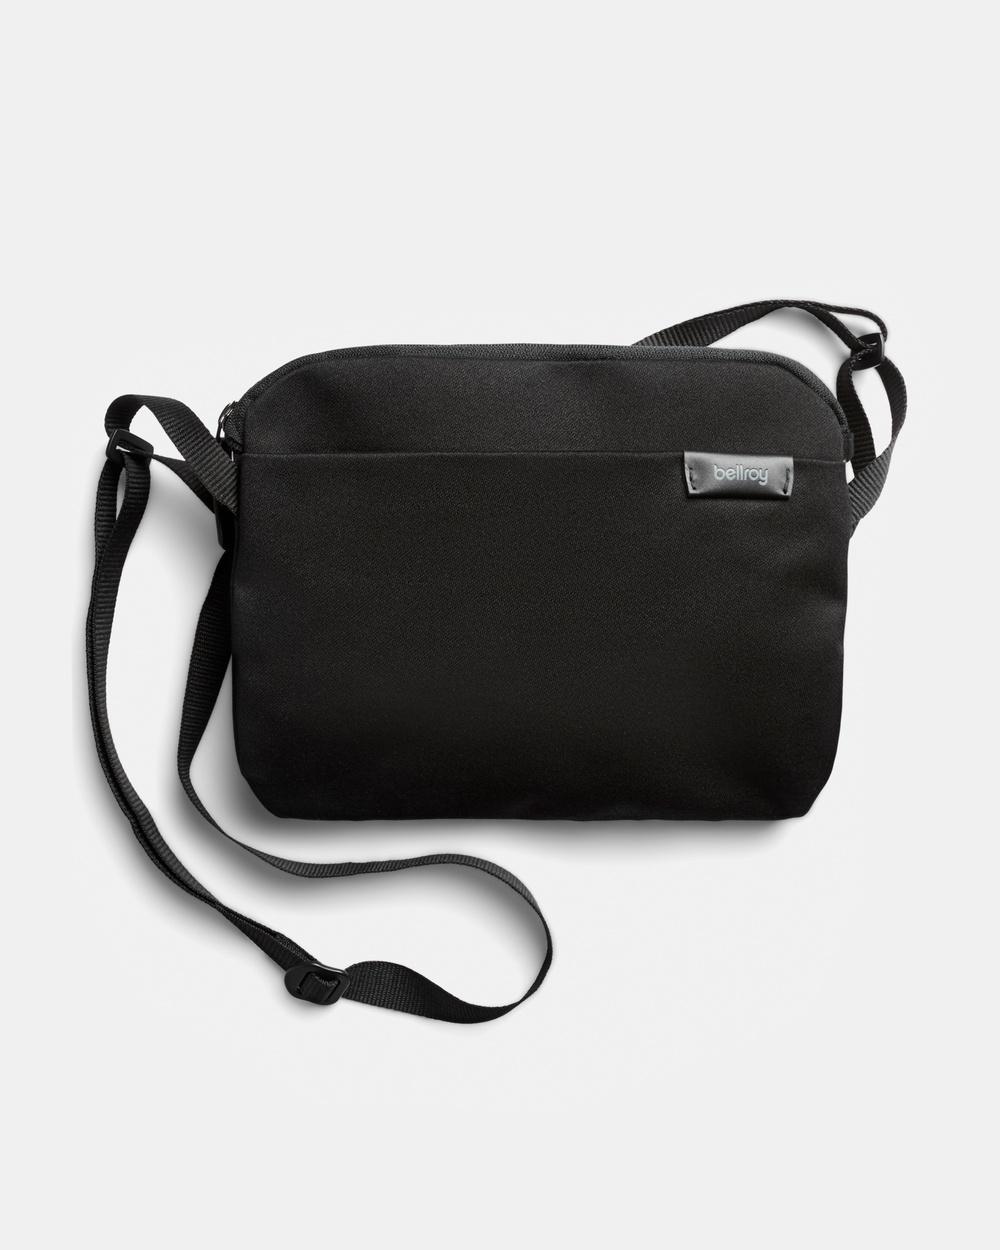 Bellroy City Pouch Plus Handbags black